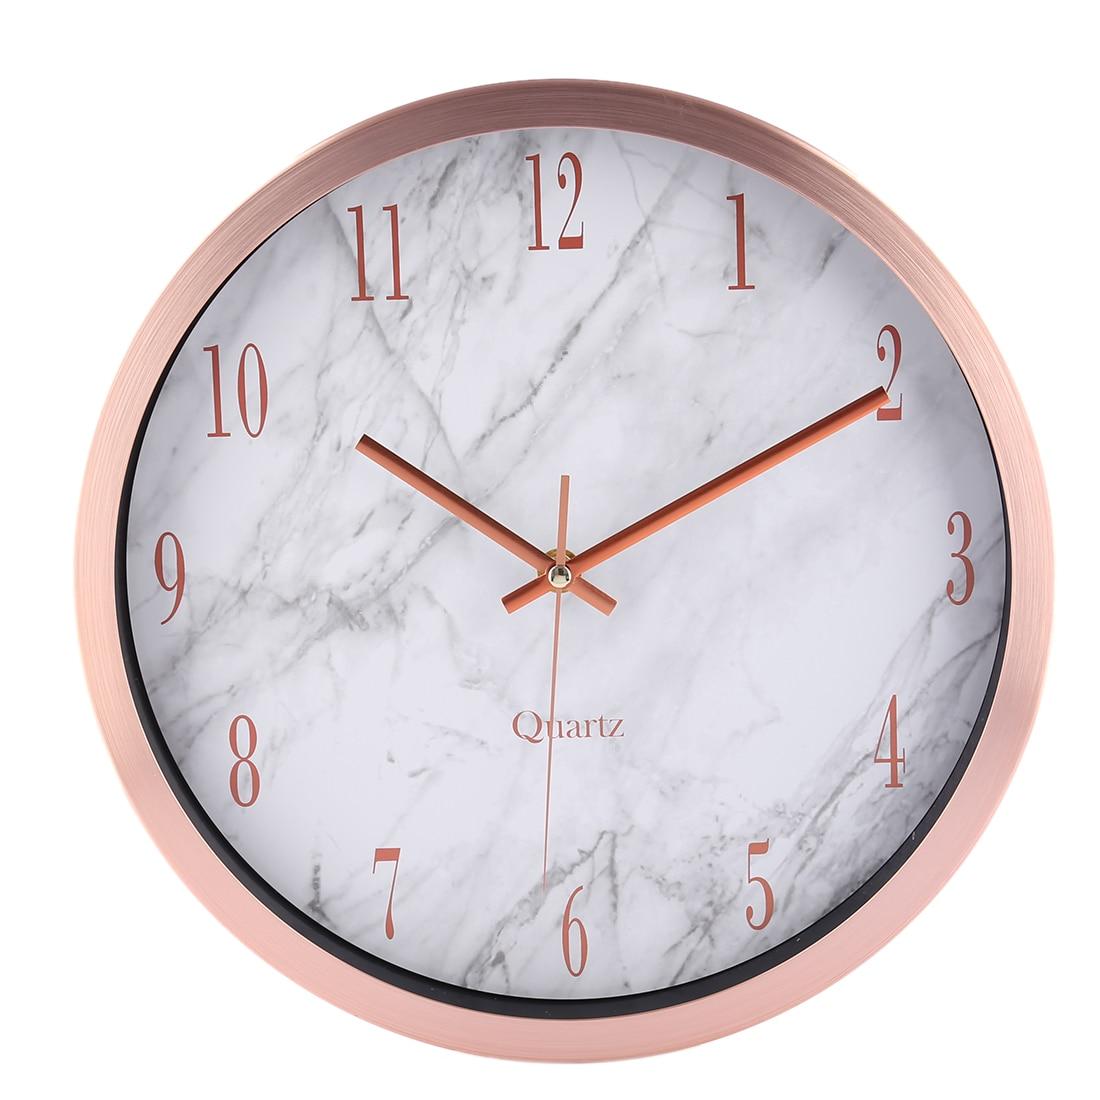 12 Inch Watch Wall Clocks Silente Round Marbling Household Office Livingroom Mute Hanging Clock Wall Decor